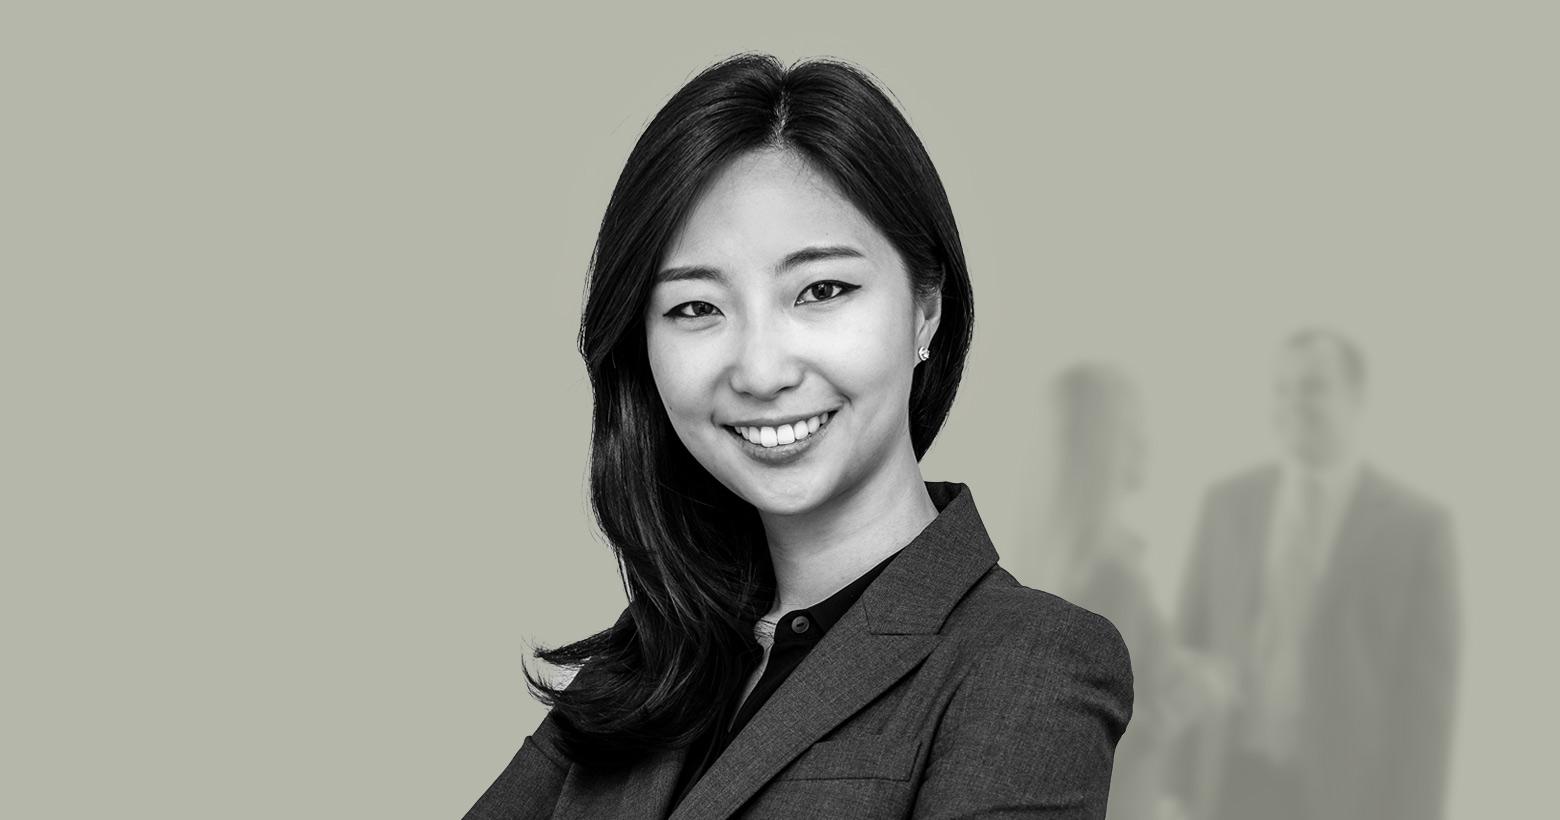 Adrienne J. Jang